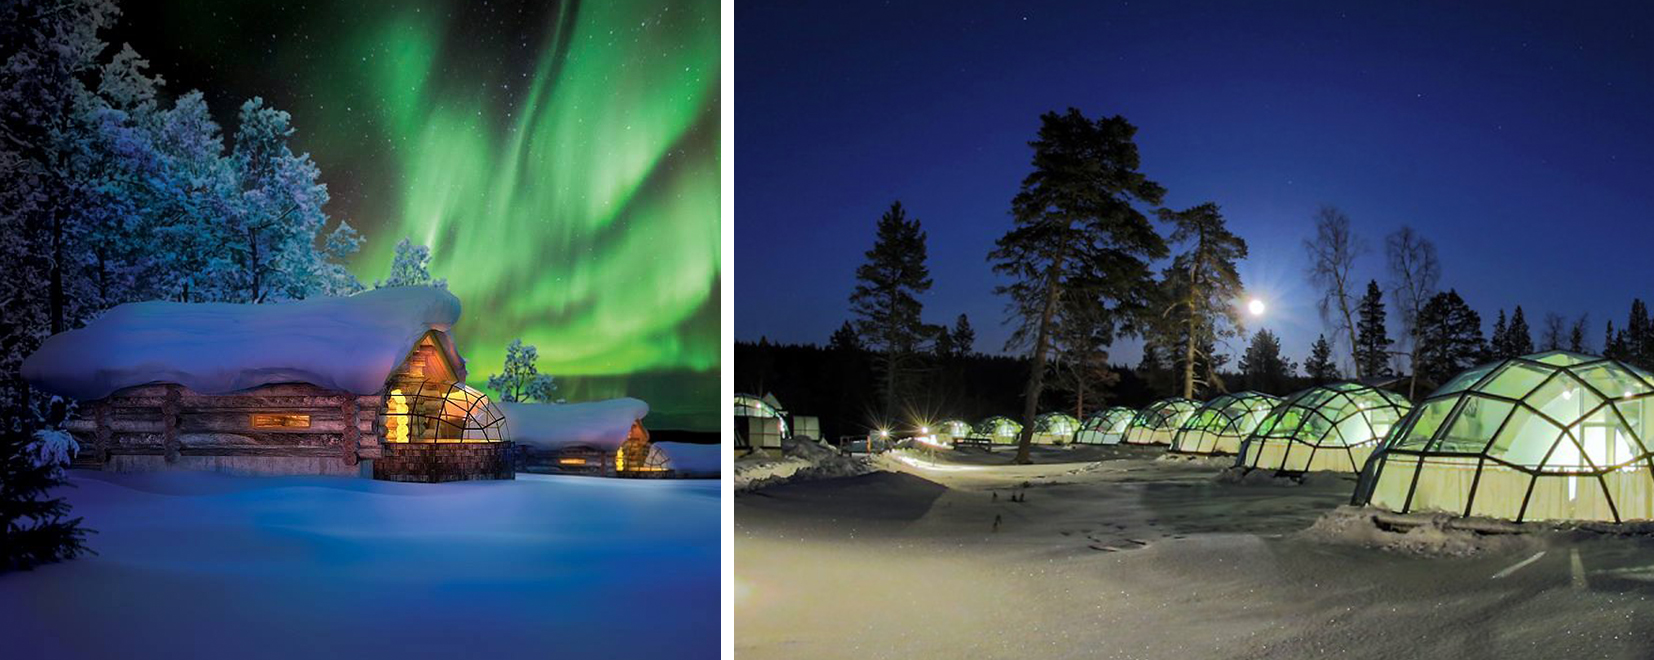 Finnish Ice Hotel